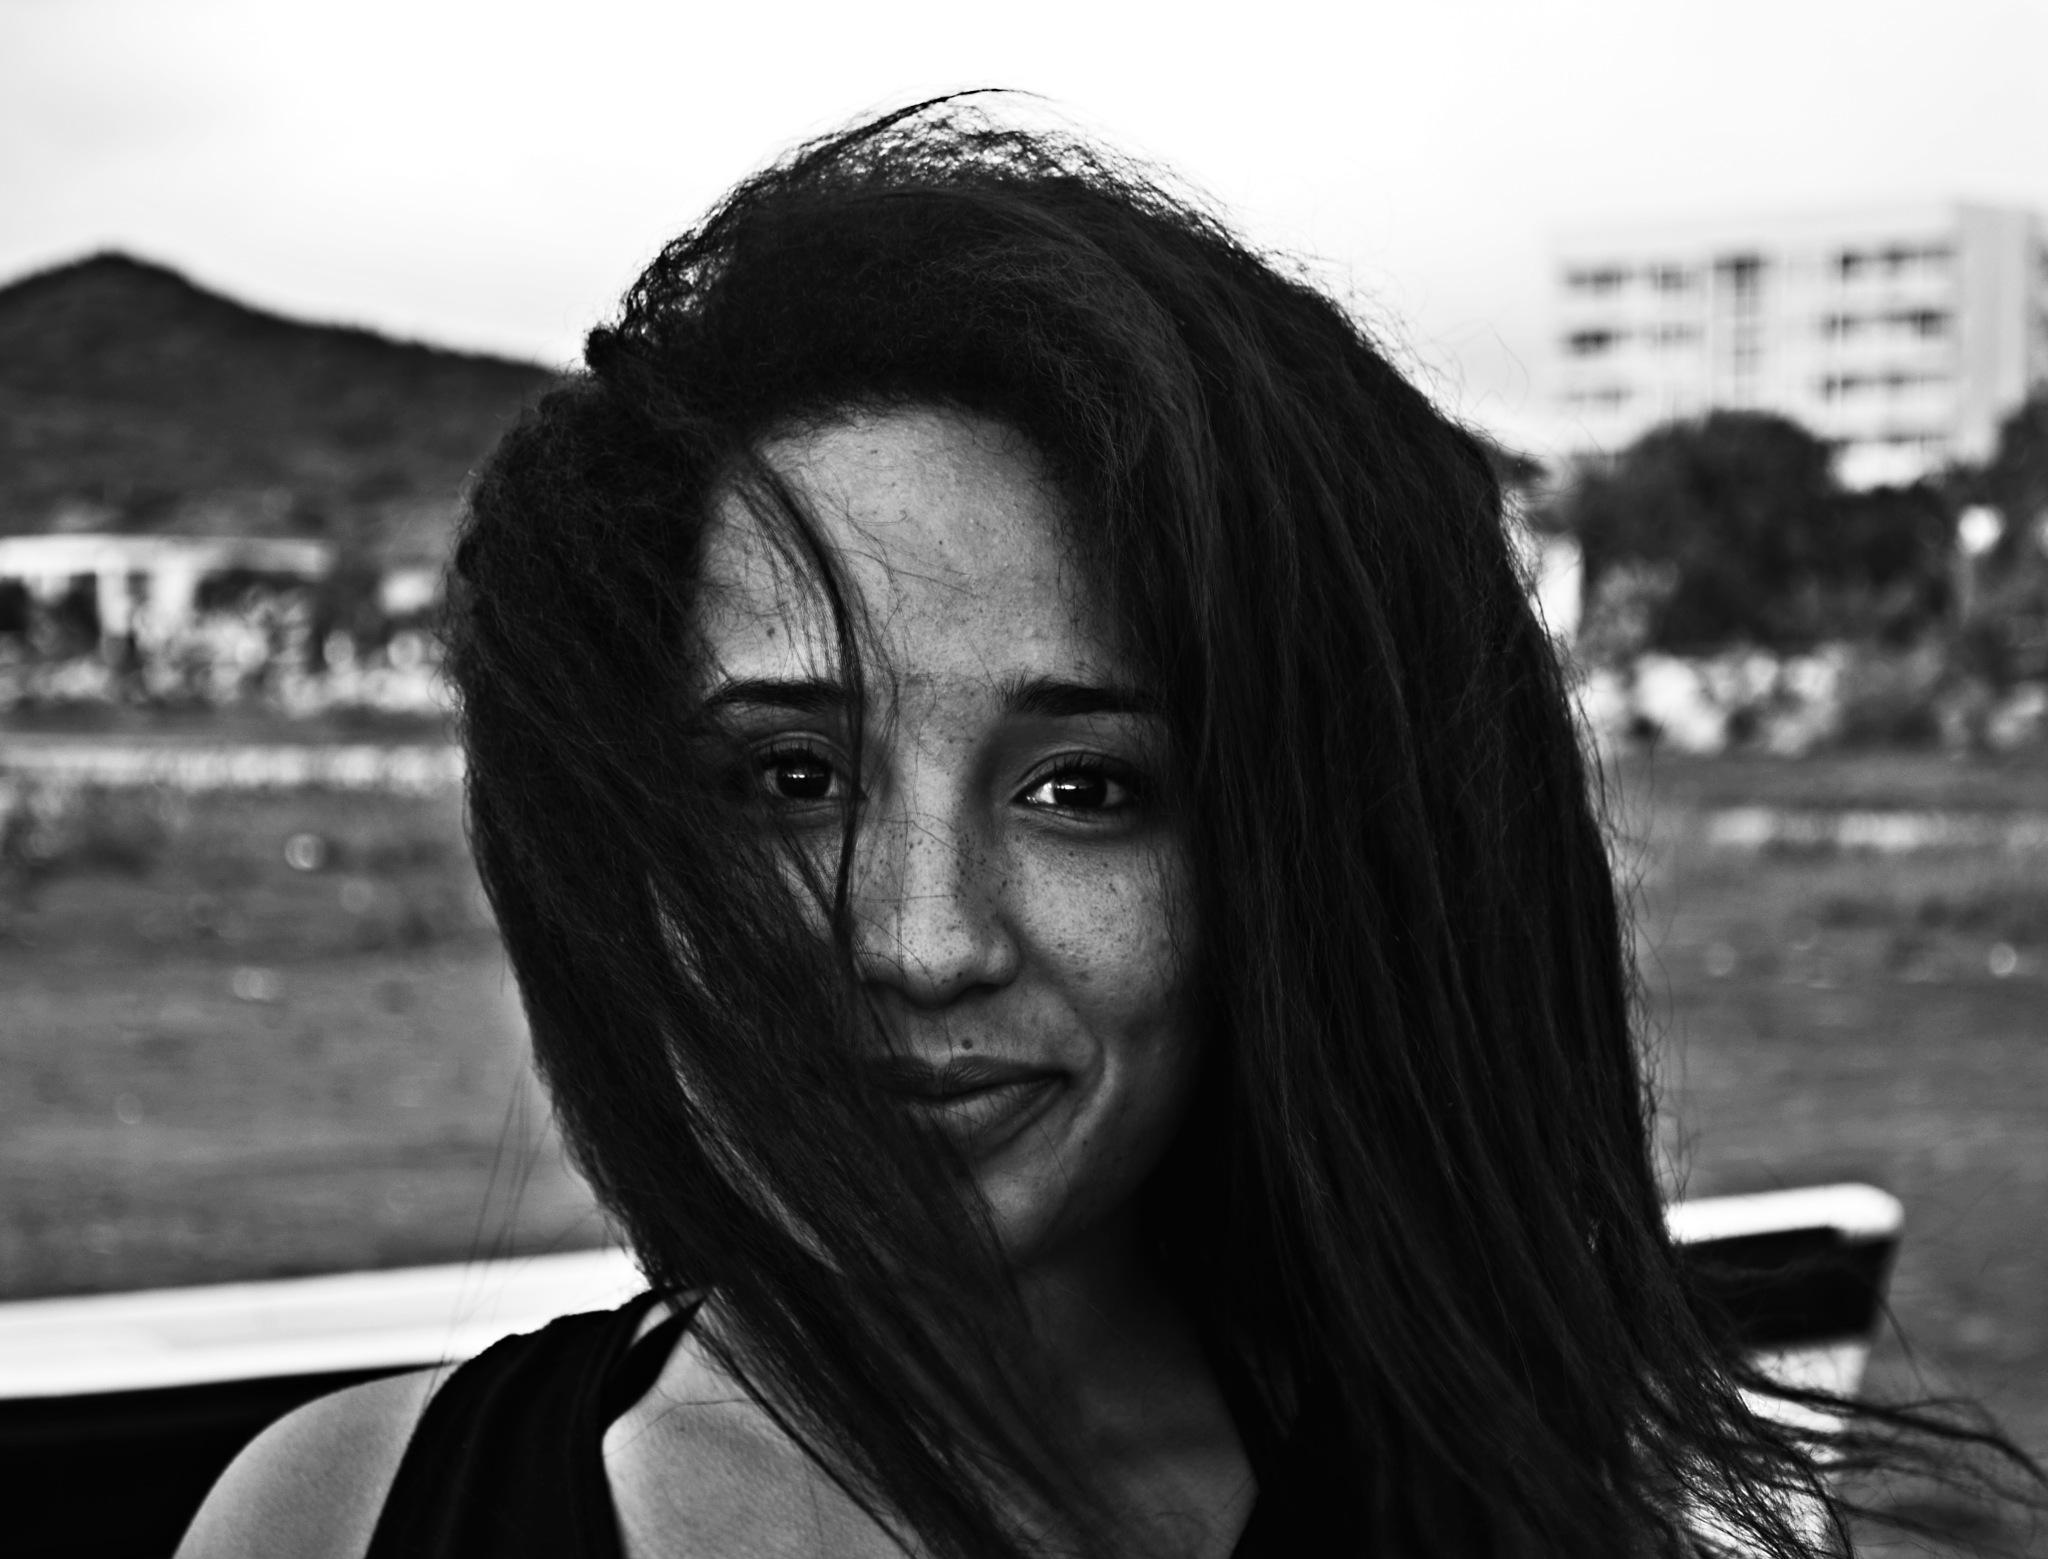 Bnw Portrait by VictorDelahoz